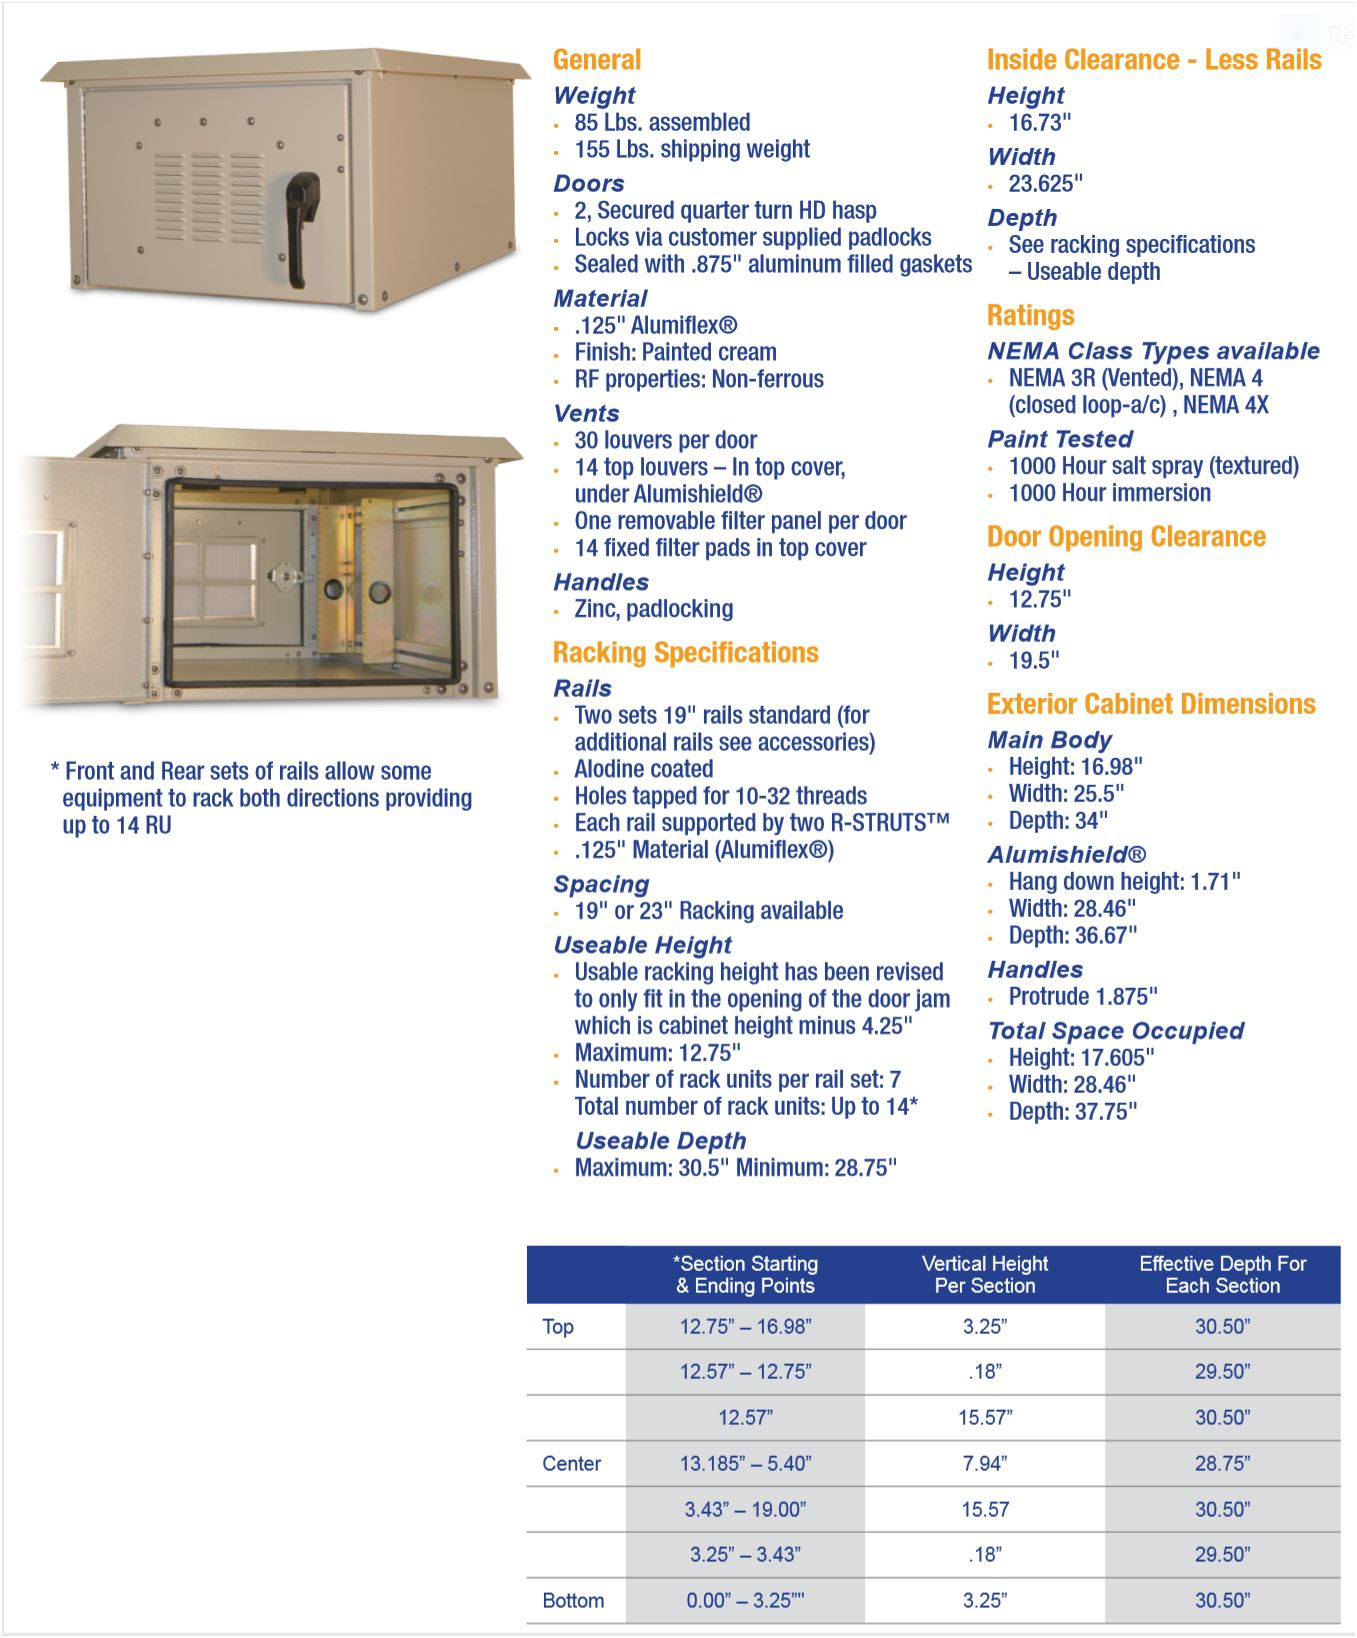 OkSolar.com Nema Outdoor Telecom Enclosures and Cabinets, Pad/Wall/Pole Mountable, wifi enclosure, wifi shelter, wifi cabinets, wimax enclosure, wimax shelter, wimax cabinets, electronic enclosures, ddb unlimited, ddb, 19 inch, 23 inch, racking, alarm cabinet, control boxes, alarm enclosure, cabinet, cabinet enclosure, cabinet housing, cabinet rack, eia 19, electrical cabinet, electrical enclosure, electrical housing, electronic cabinet, electronic enclosure, electronic rack, electric enclosure, enclosure, equipment rack, metal enclosure, nema 3, nema 3 cabinet, nema 3 enclosure, nema 3r, nema 3r cabinet, nema 3r enclosure, nema 4, nema 4x, nema 4 cabinet, nema 4 enclosure, nema 4x cabinet, nema 4x enclosure, weatherproof enclosure, weatherproof enclosures,  nema enclosure, nema enclsures,  nema, nema cabinet, nema cabinets, outdoor cabinet, outdoor cabinets, outdoor enclosure, outdoor enclosures, streetlight enclosure, aluminum, shelter, shelters, nema, enclosure, enclosures, elctrical enclosure, traffic control enclosure, traffic enclosure, 1 ru rack, 2 ru rack, 3 ru rack, 4 ru rack, 5 ru rack, 6 ru rack, 7 ru rack, 8 ru rack, 9 ru rack, 10 ru rack.